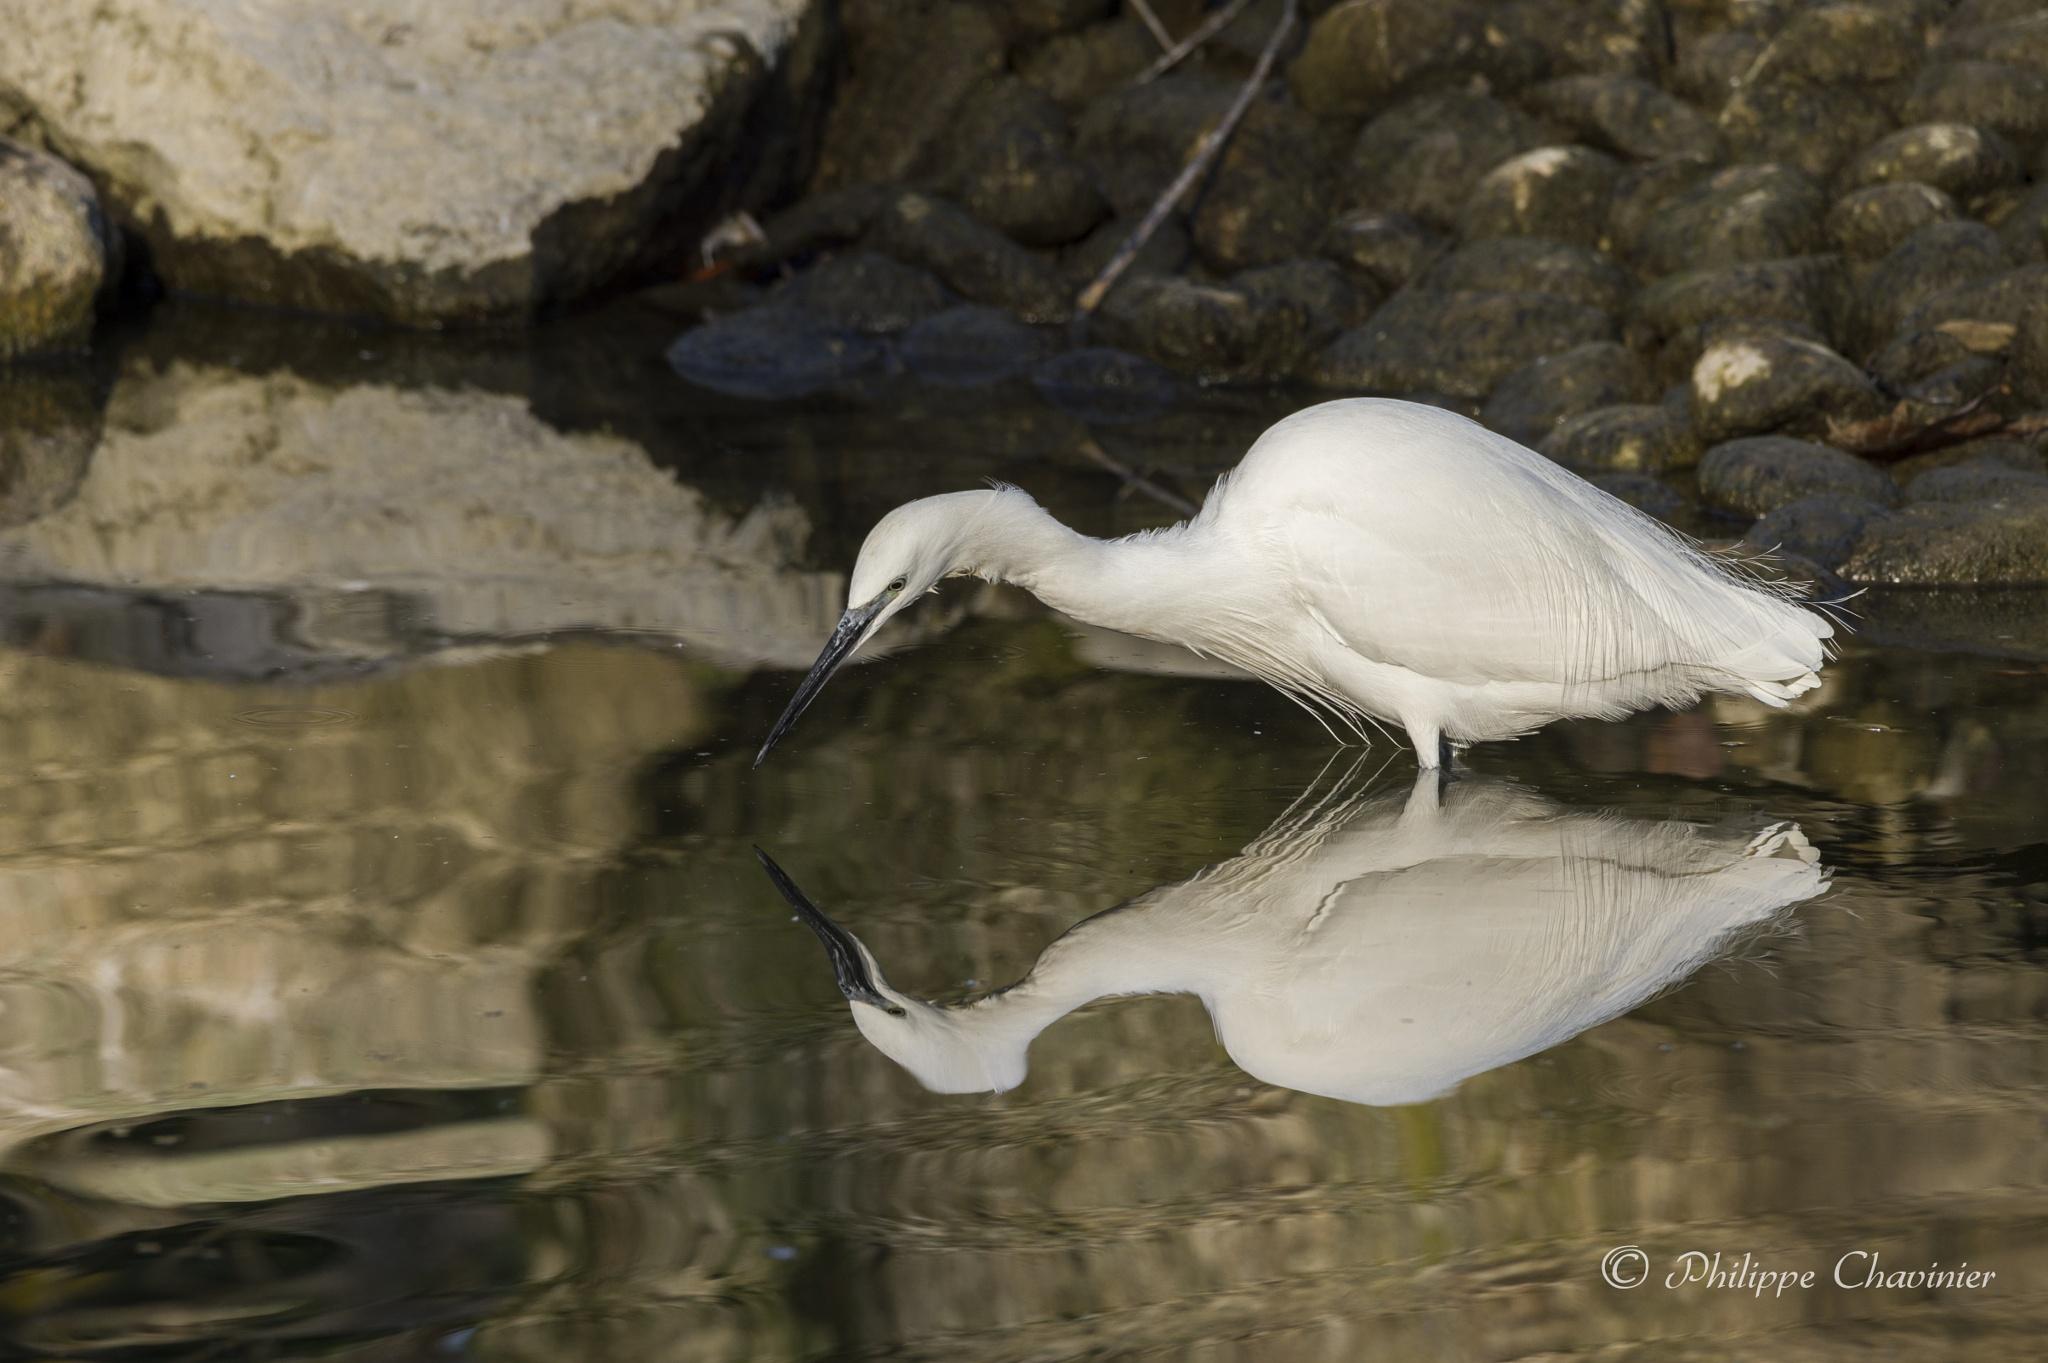 Egret by Philippe Chavinier